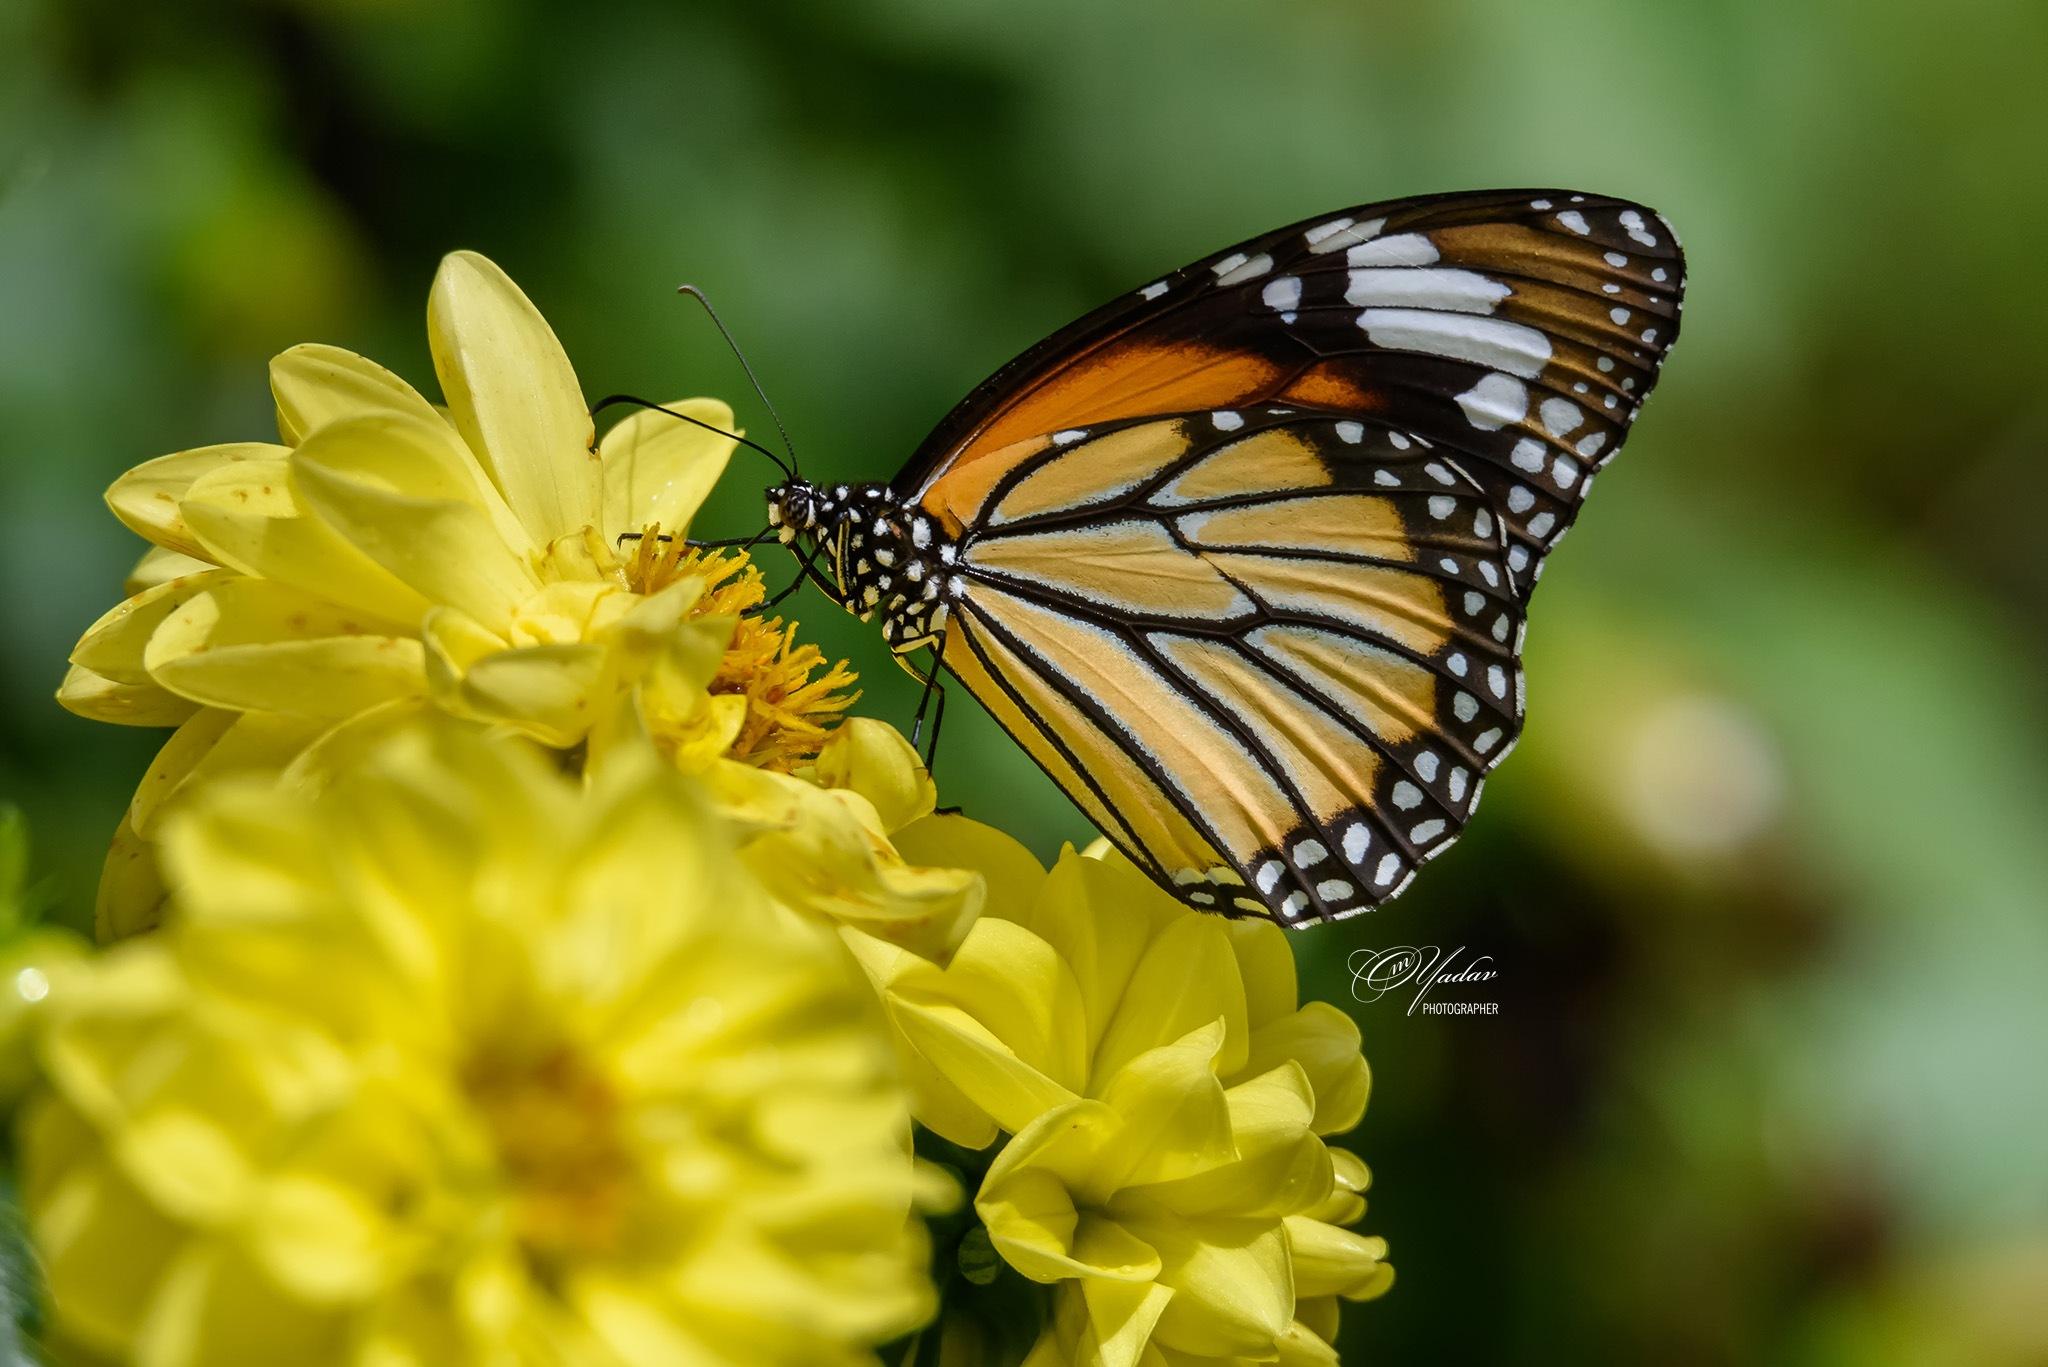 Common Tiger Butterfly by Om Yadav